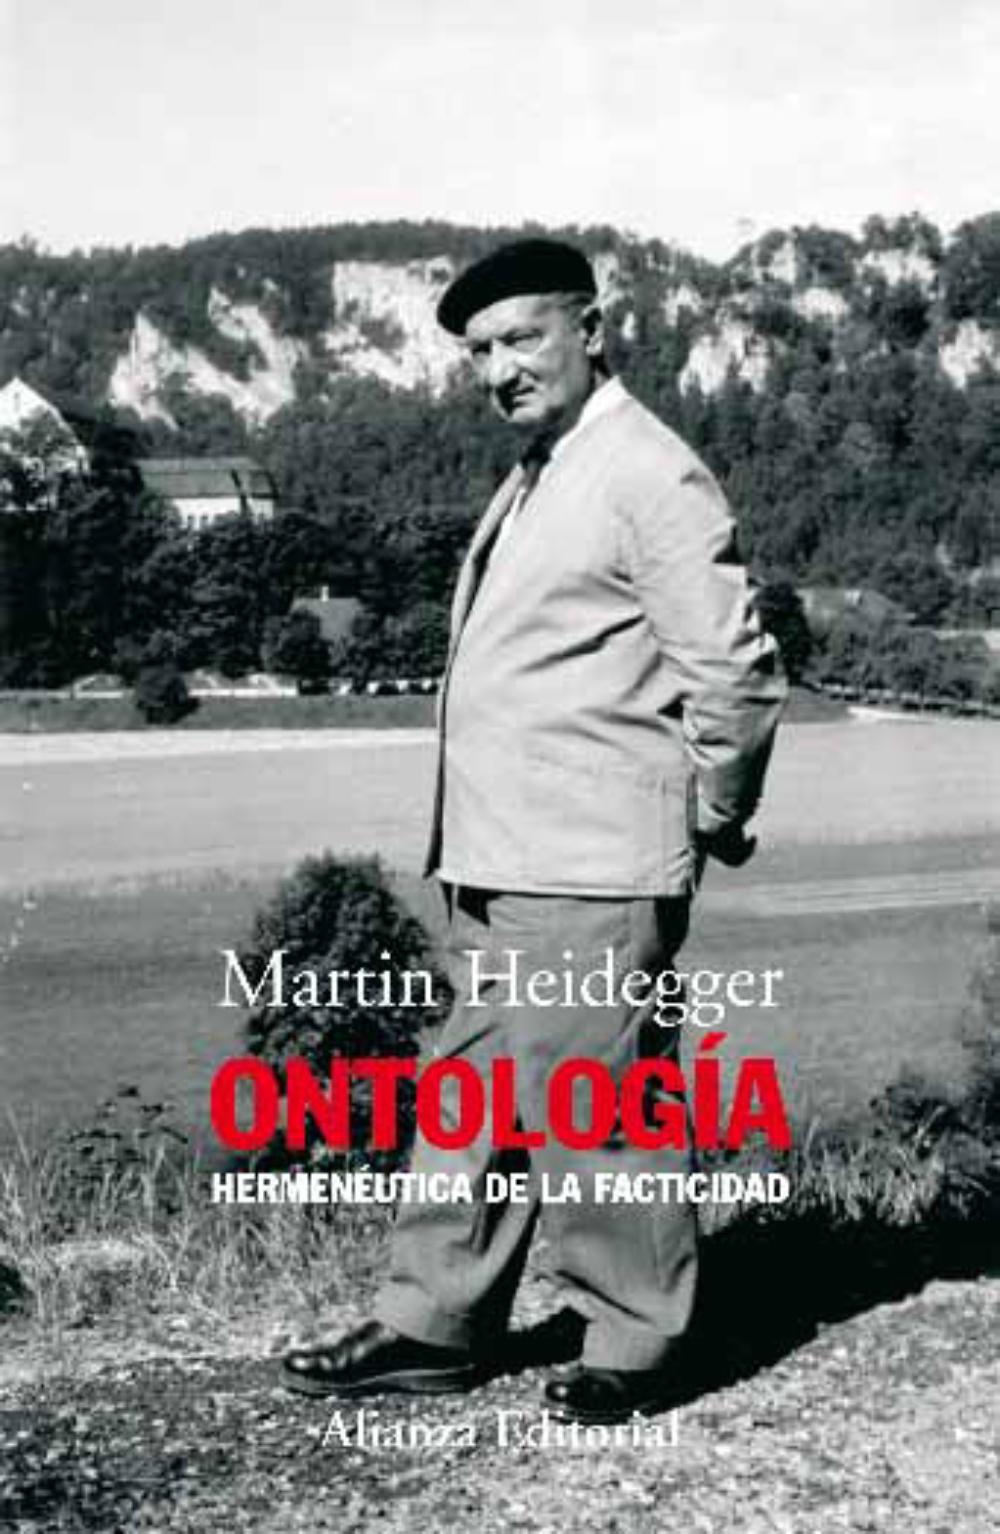 Ontologia: Hermeneutica De La Facticidad - Heidegger Martin